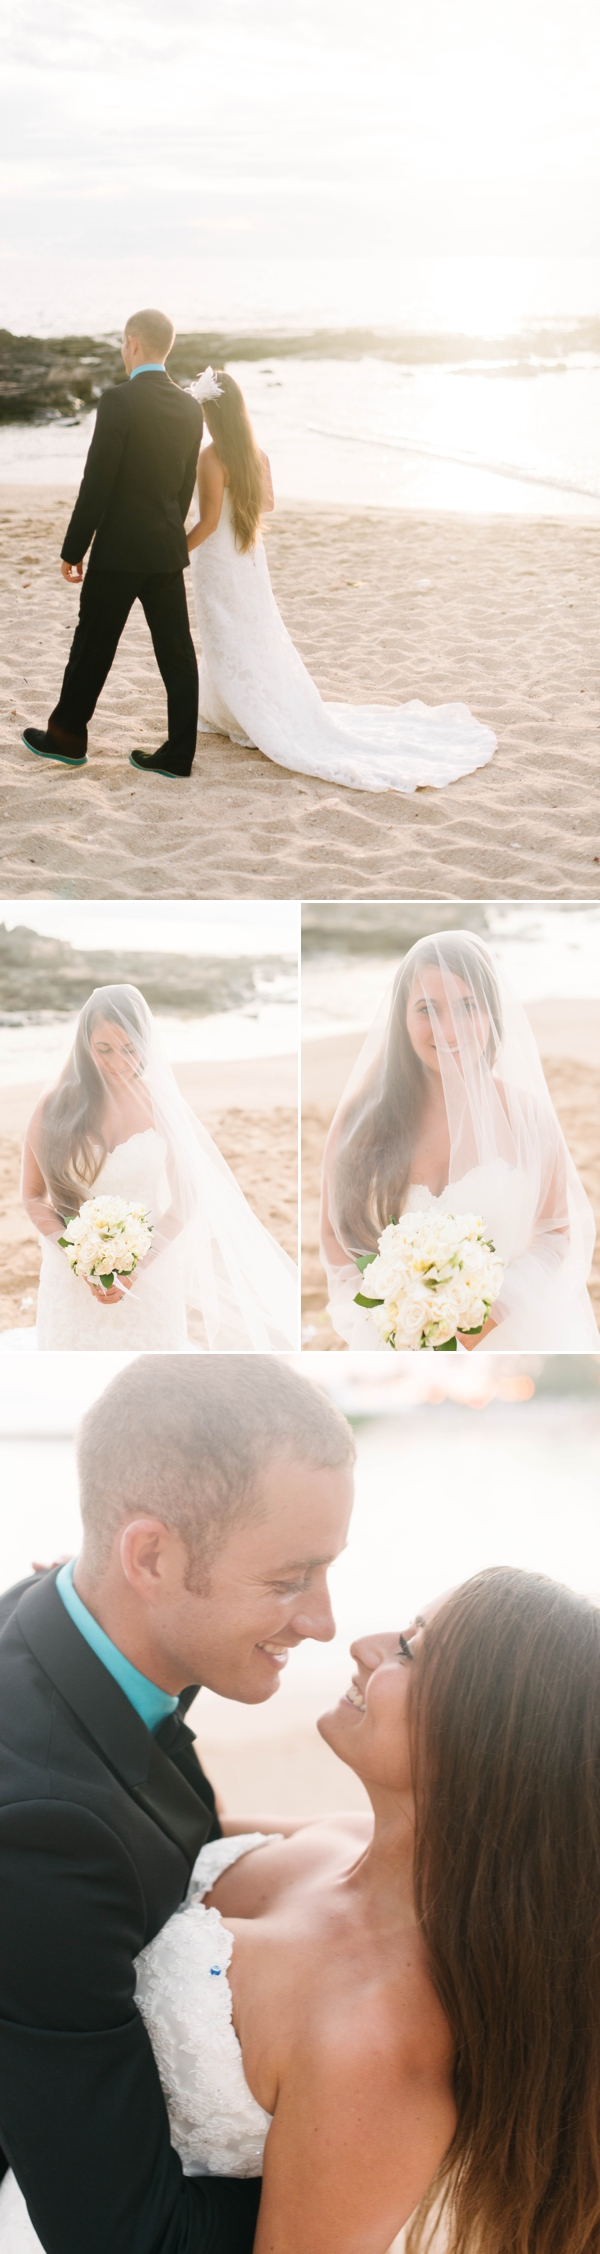 Elope to Ko Olina Beach Hawaii Photographer Melissa Wessel